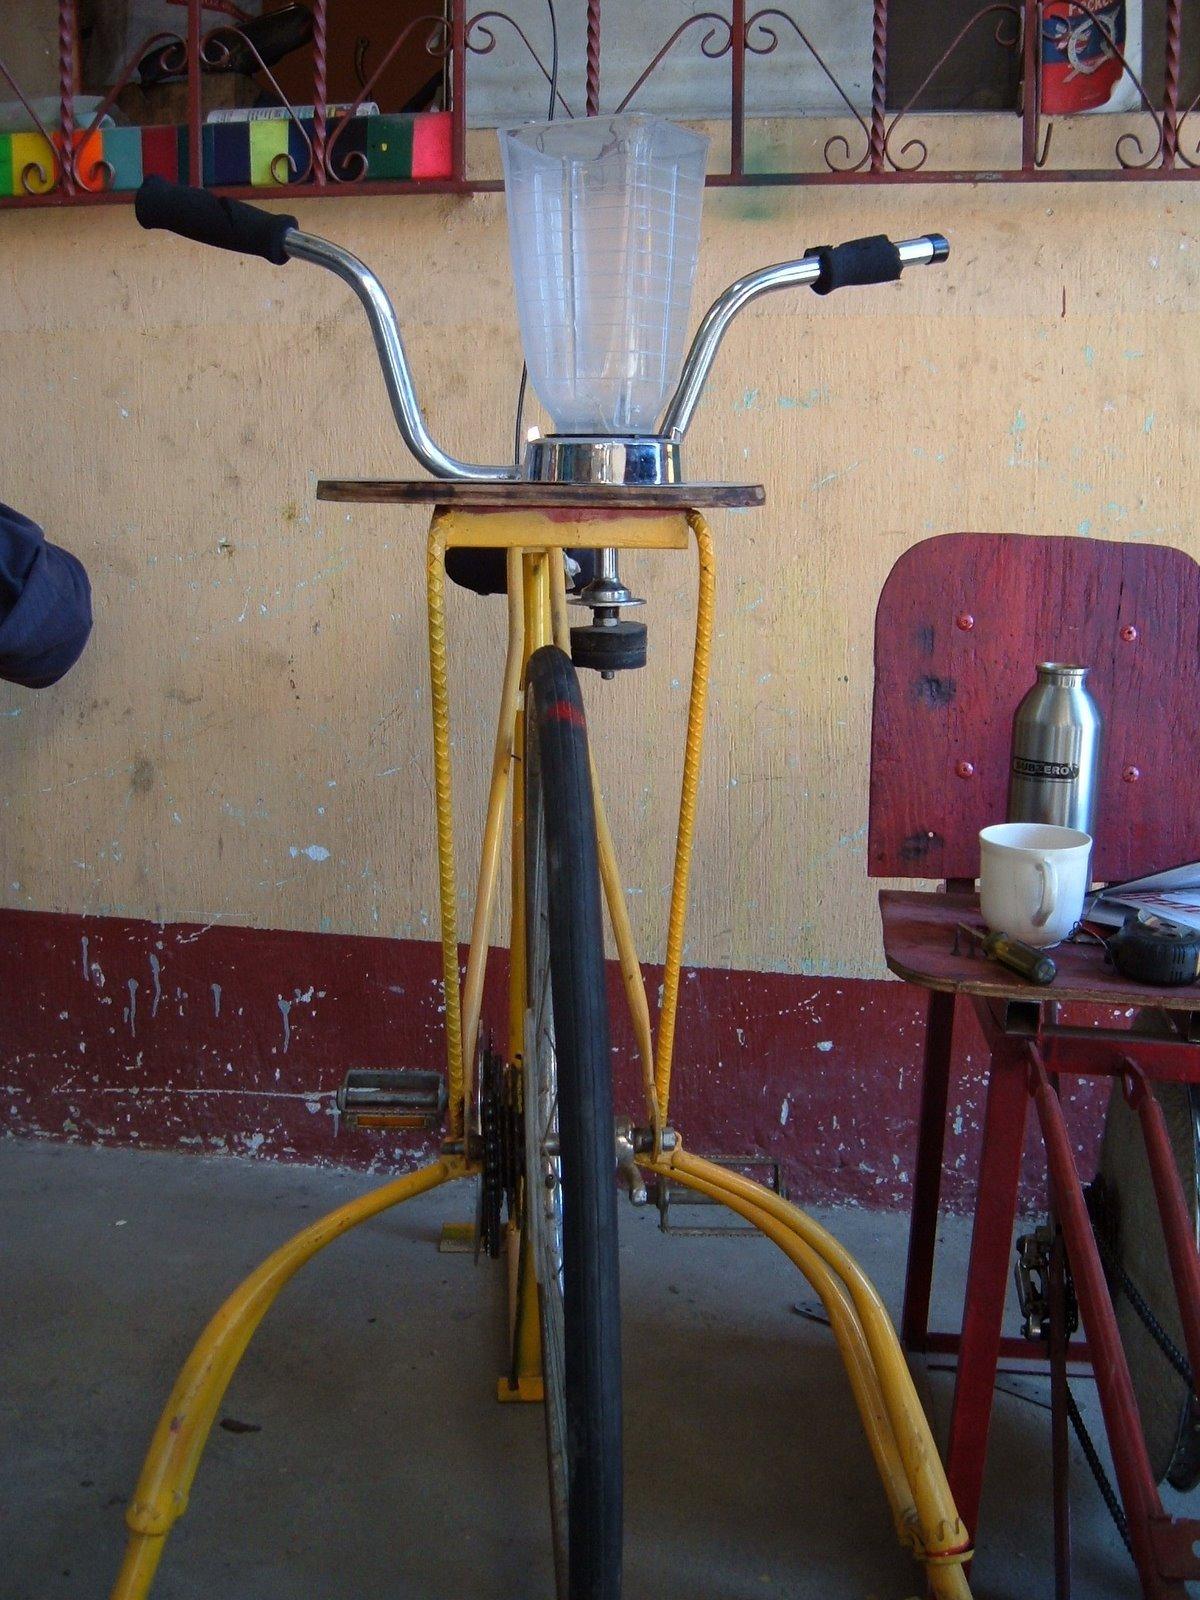 Maya Pedal bike blender